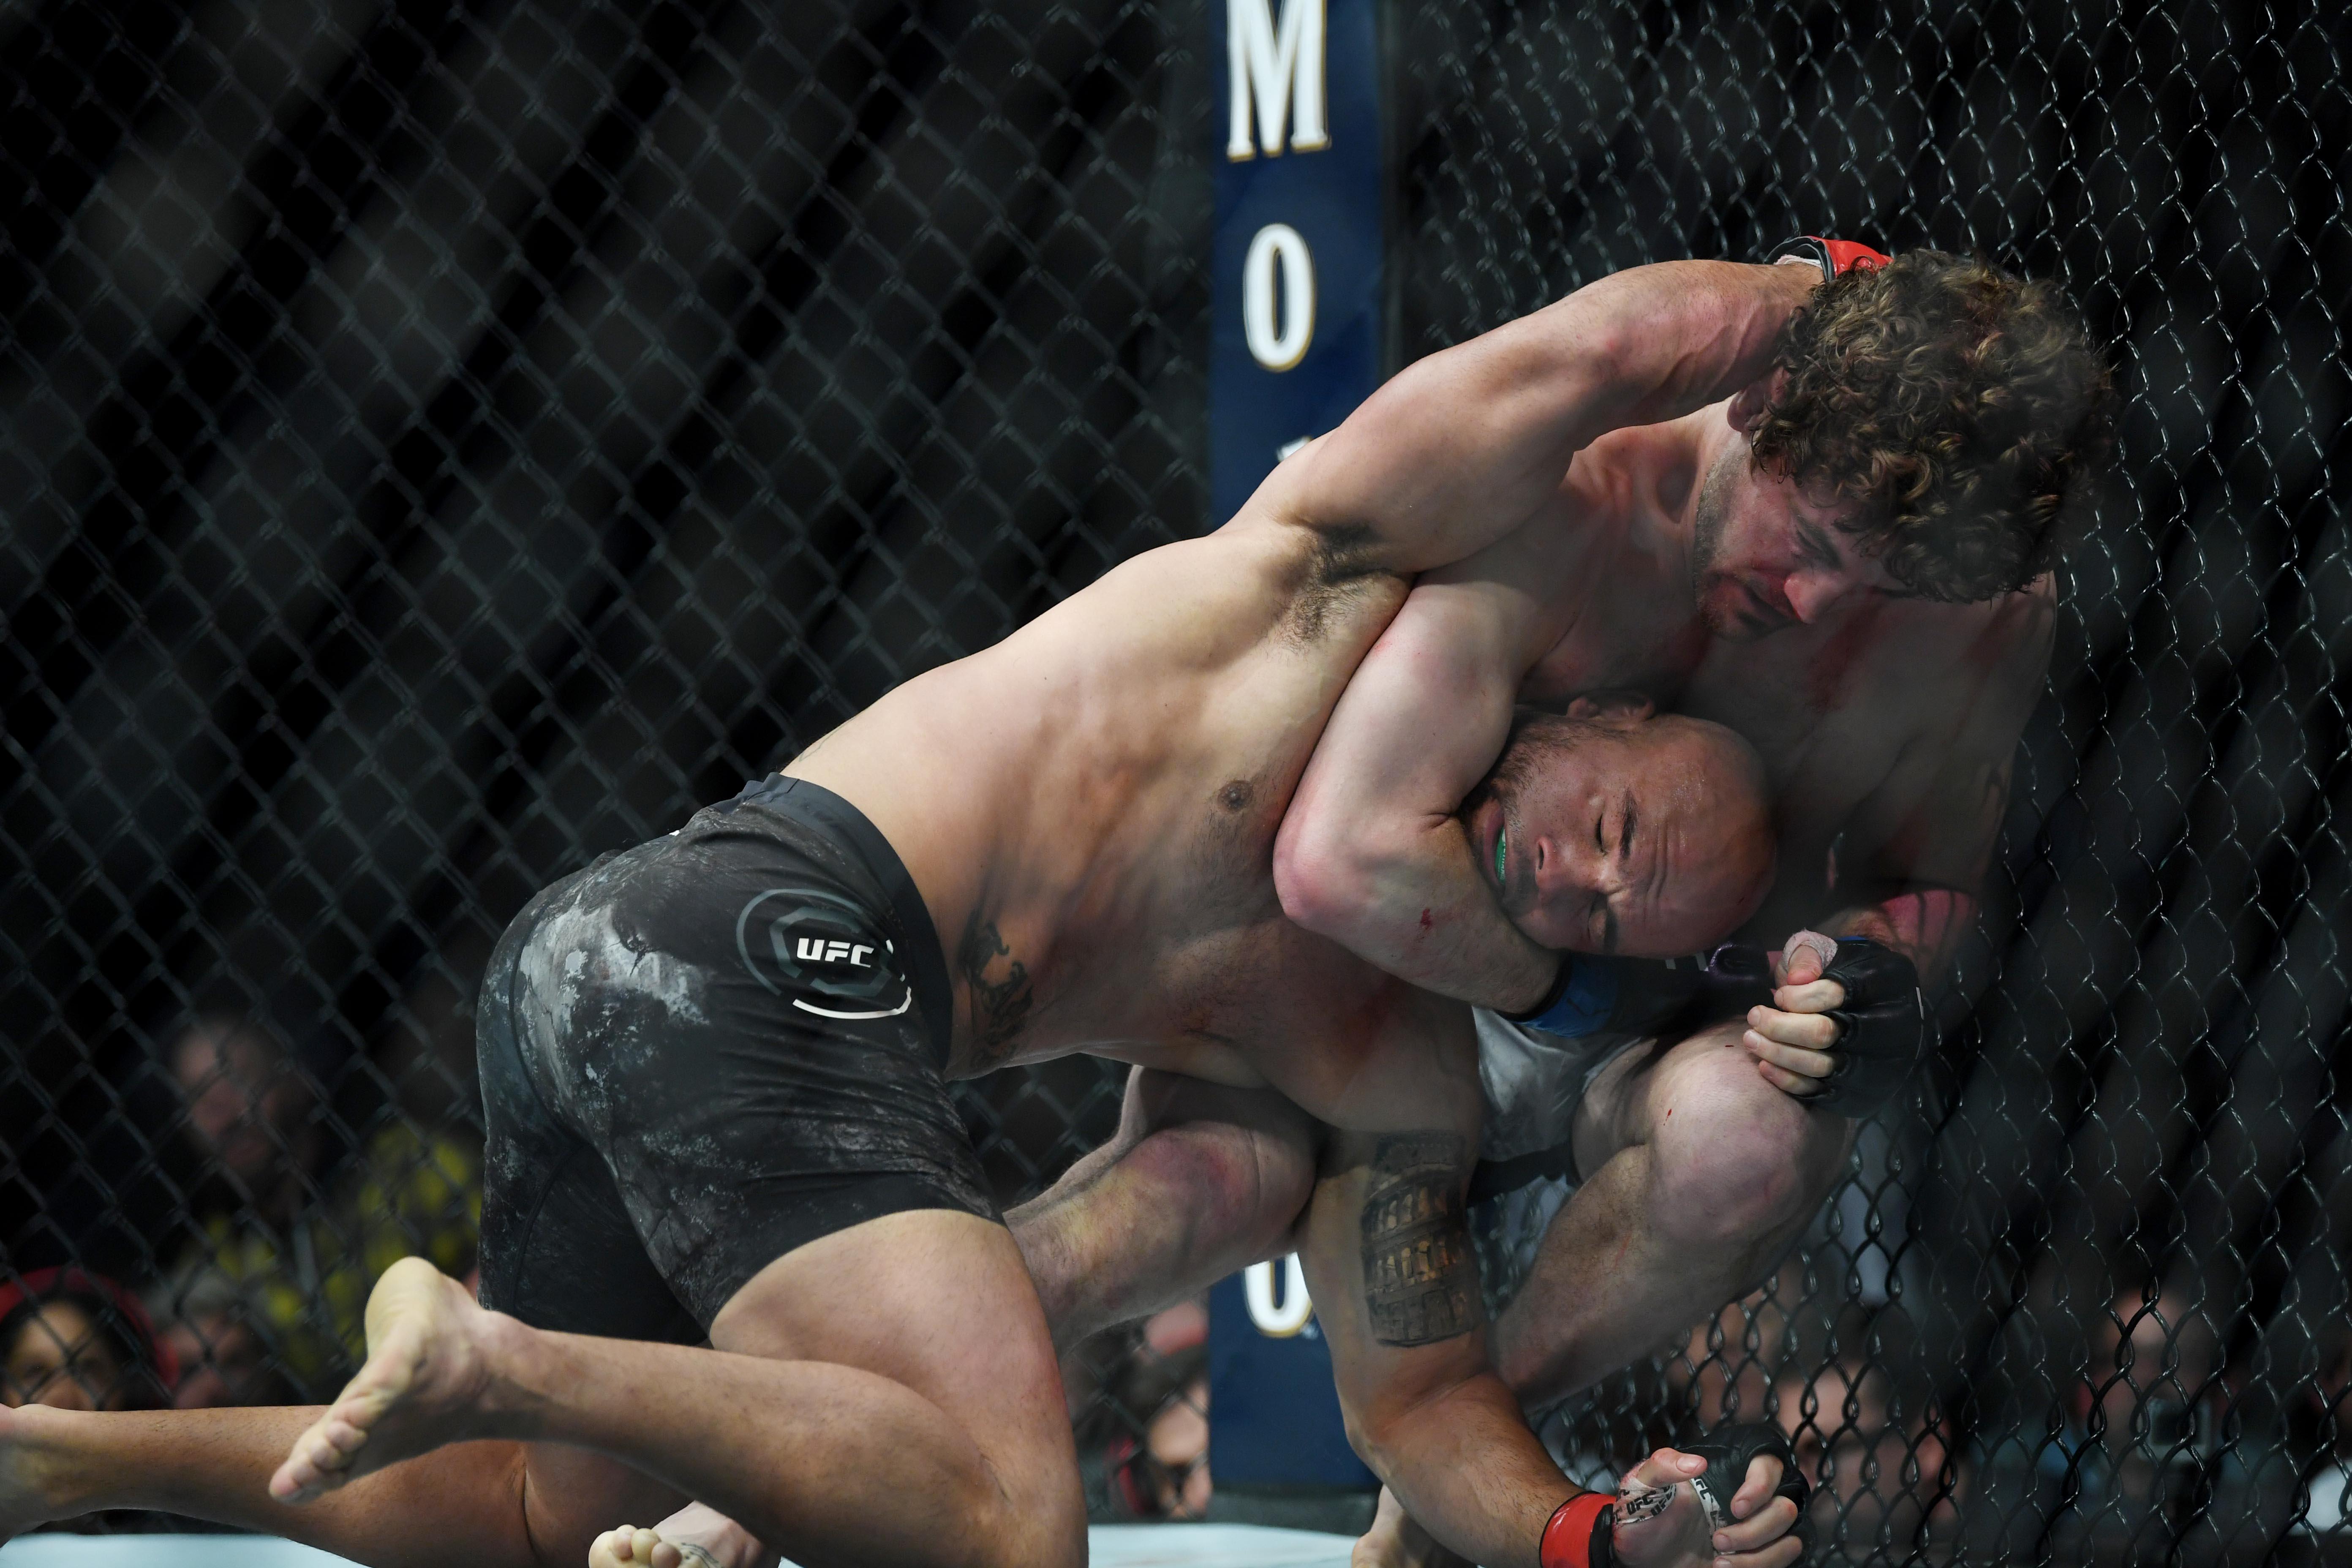 UFC 235: Ben Askren wins his UFC debut against Robbie Lawler in controversial fashion